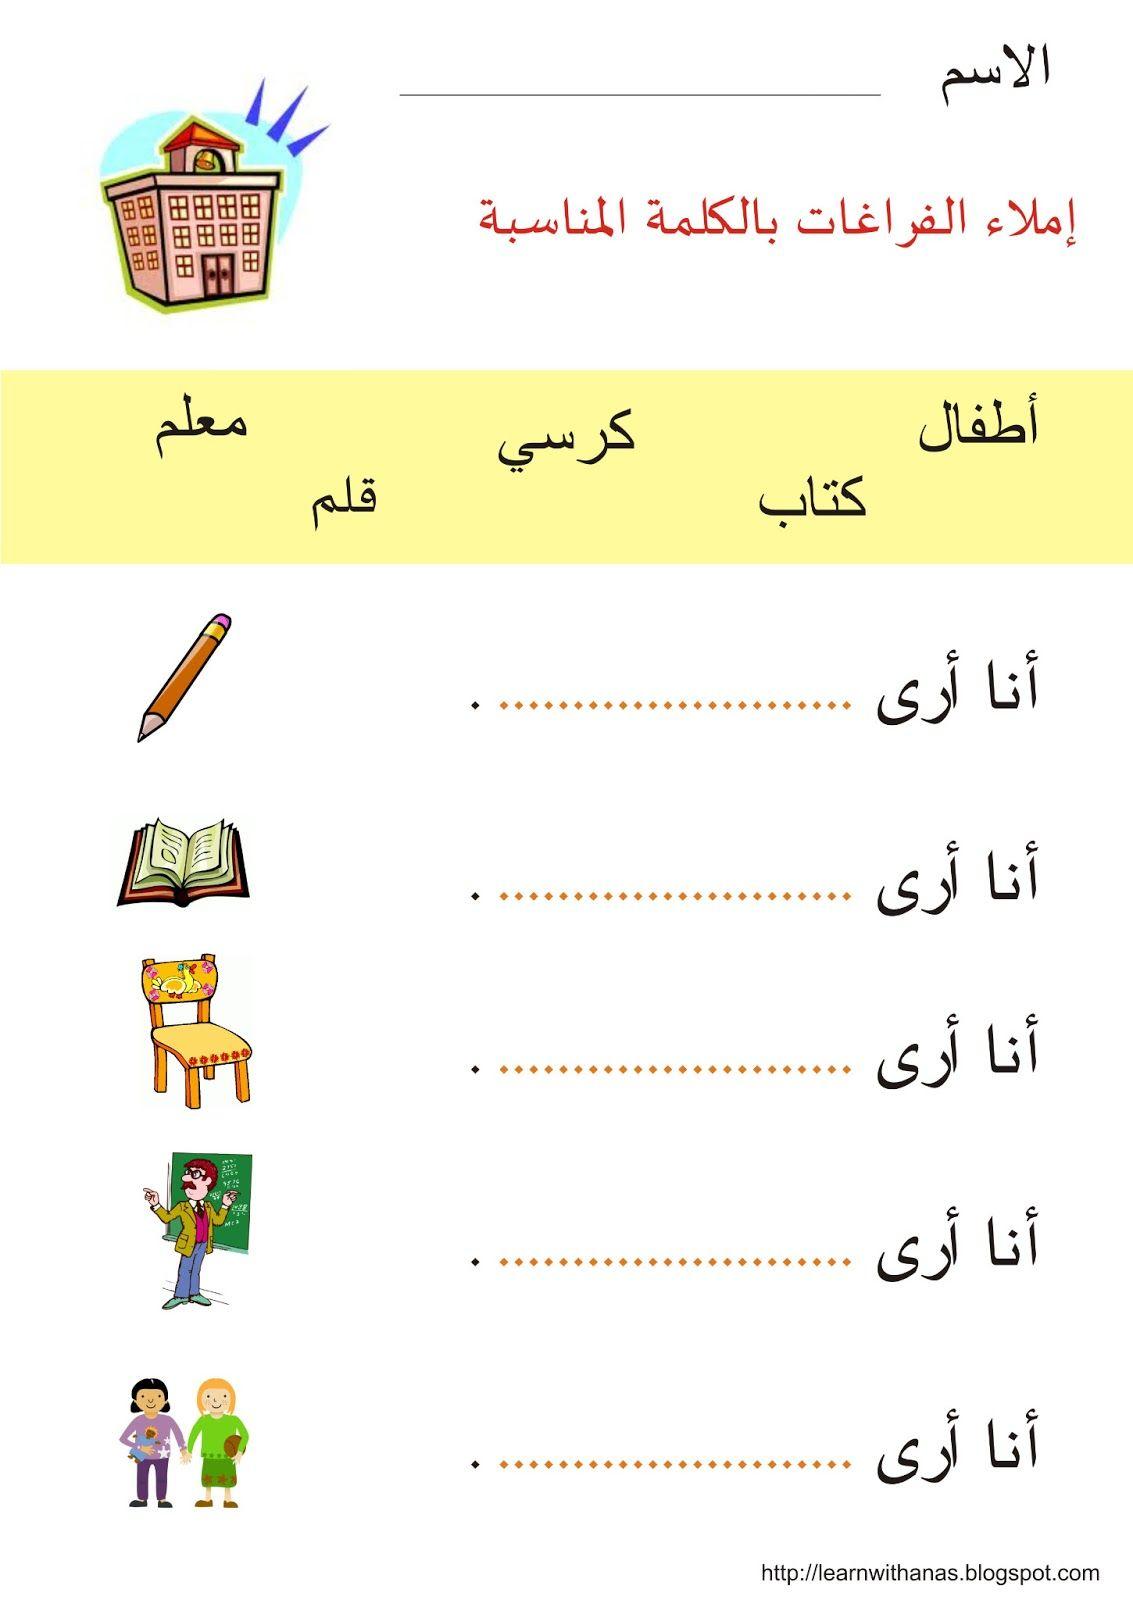 feladatlapok arabic learning arabic arabic alphabet letters s learn arabic alphabet. Black Bedroom Furniture Sets. Home Design Ideas